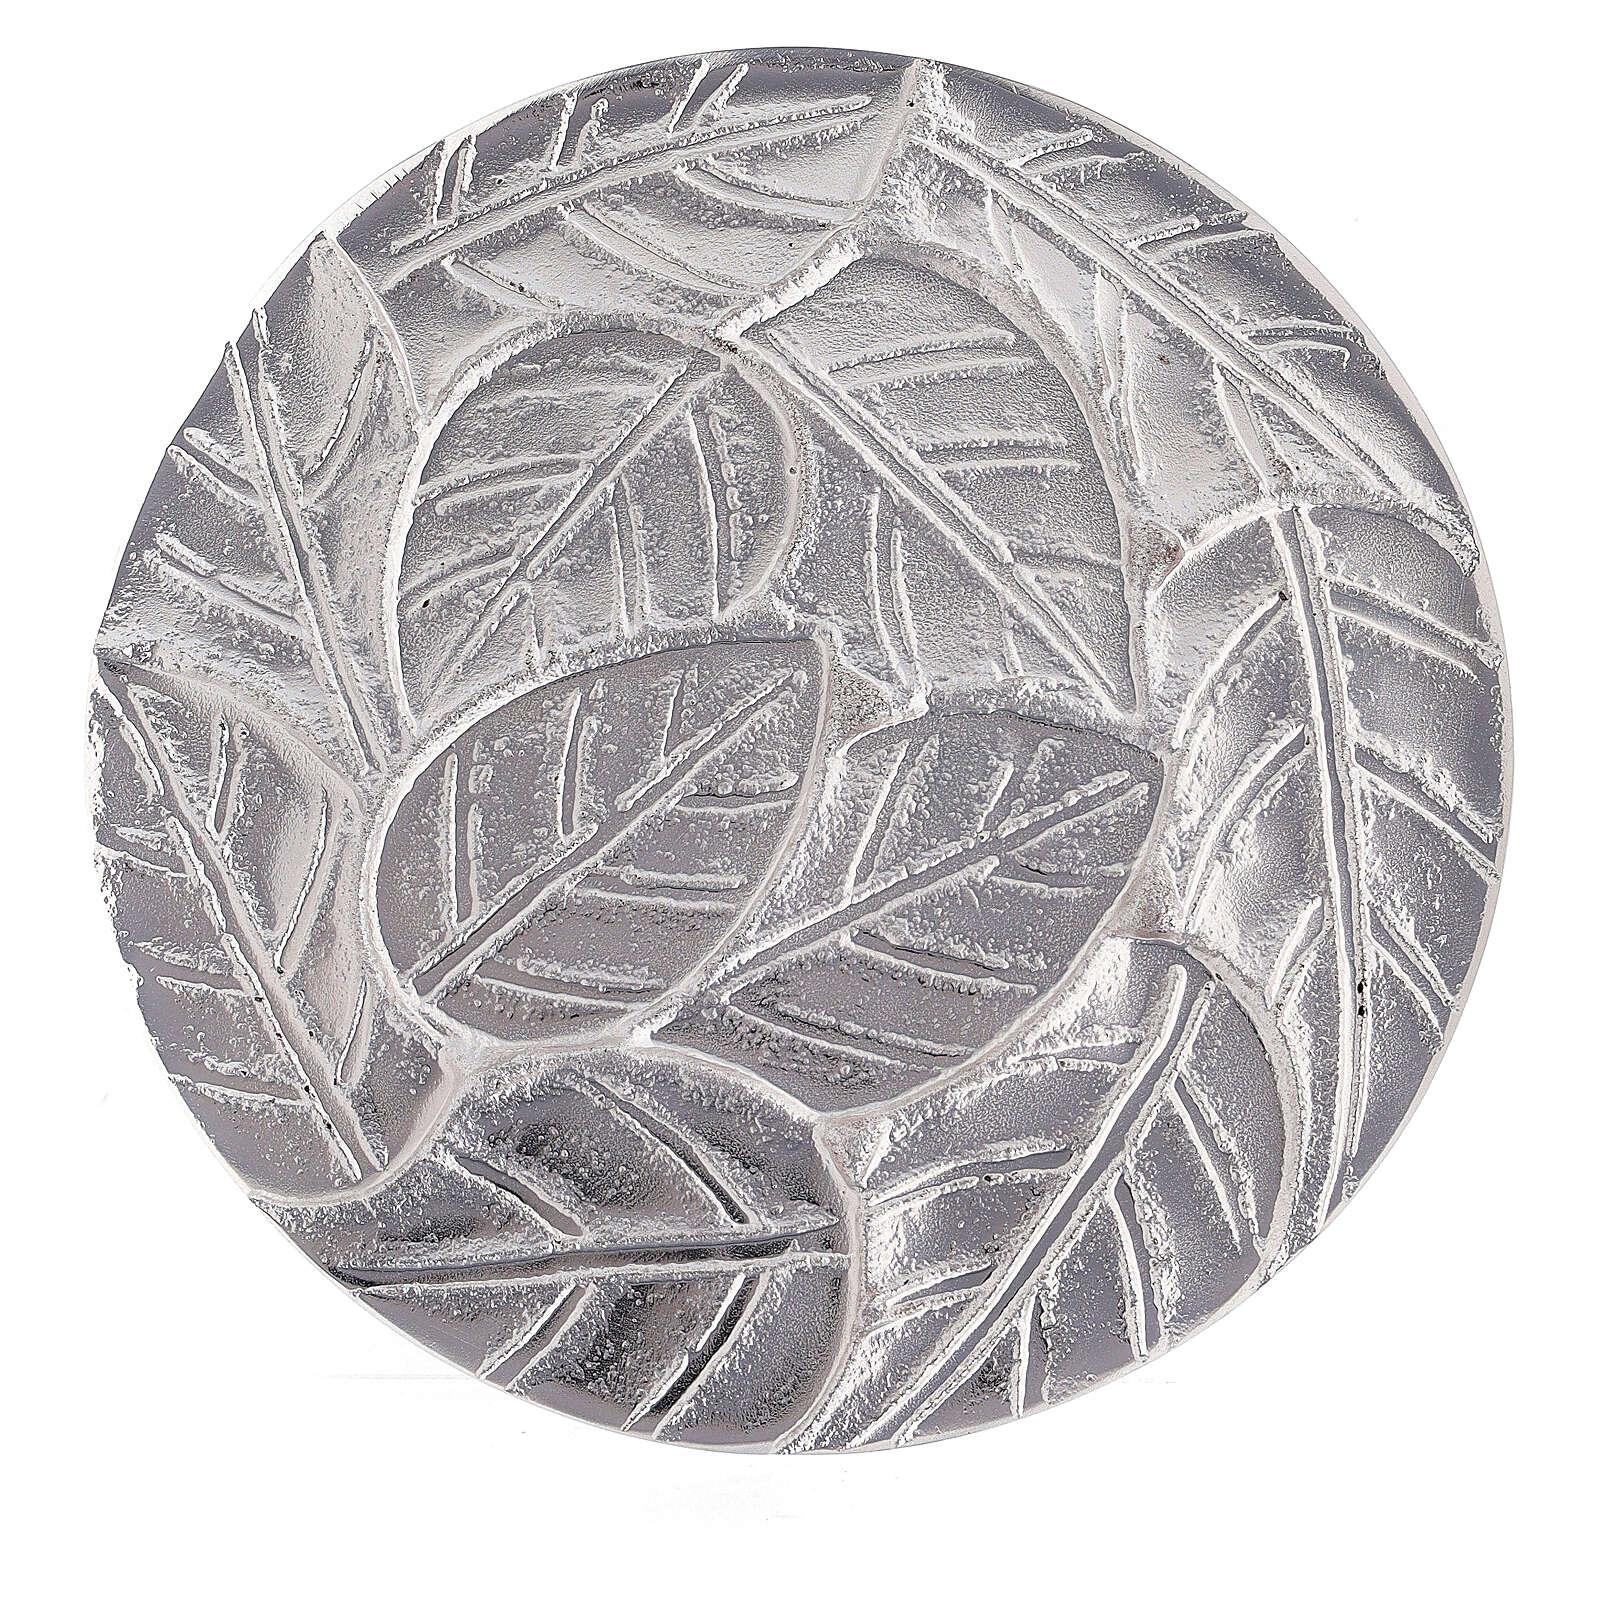 Plato portavela hojas en relieve aluminio diámetro 14 cm 3